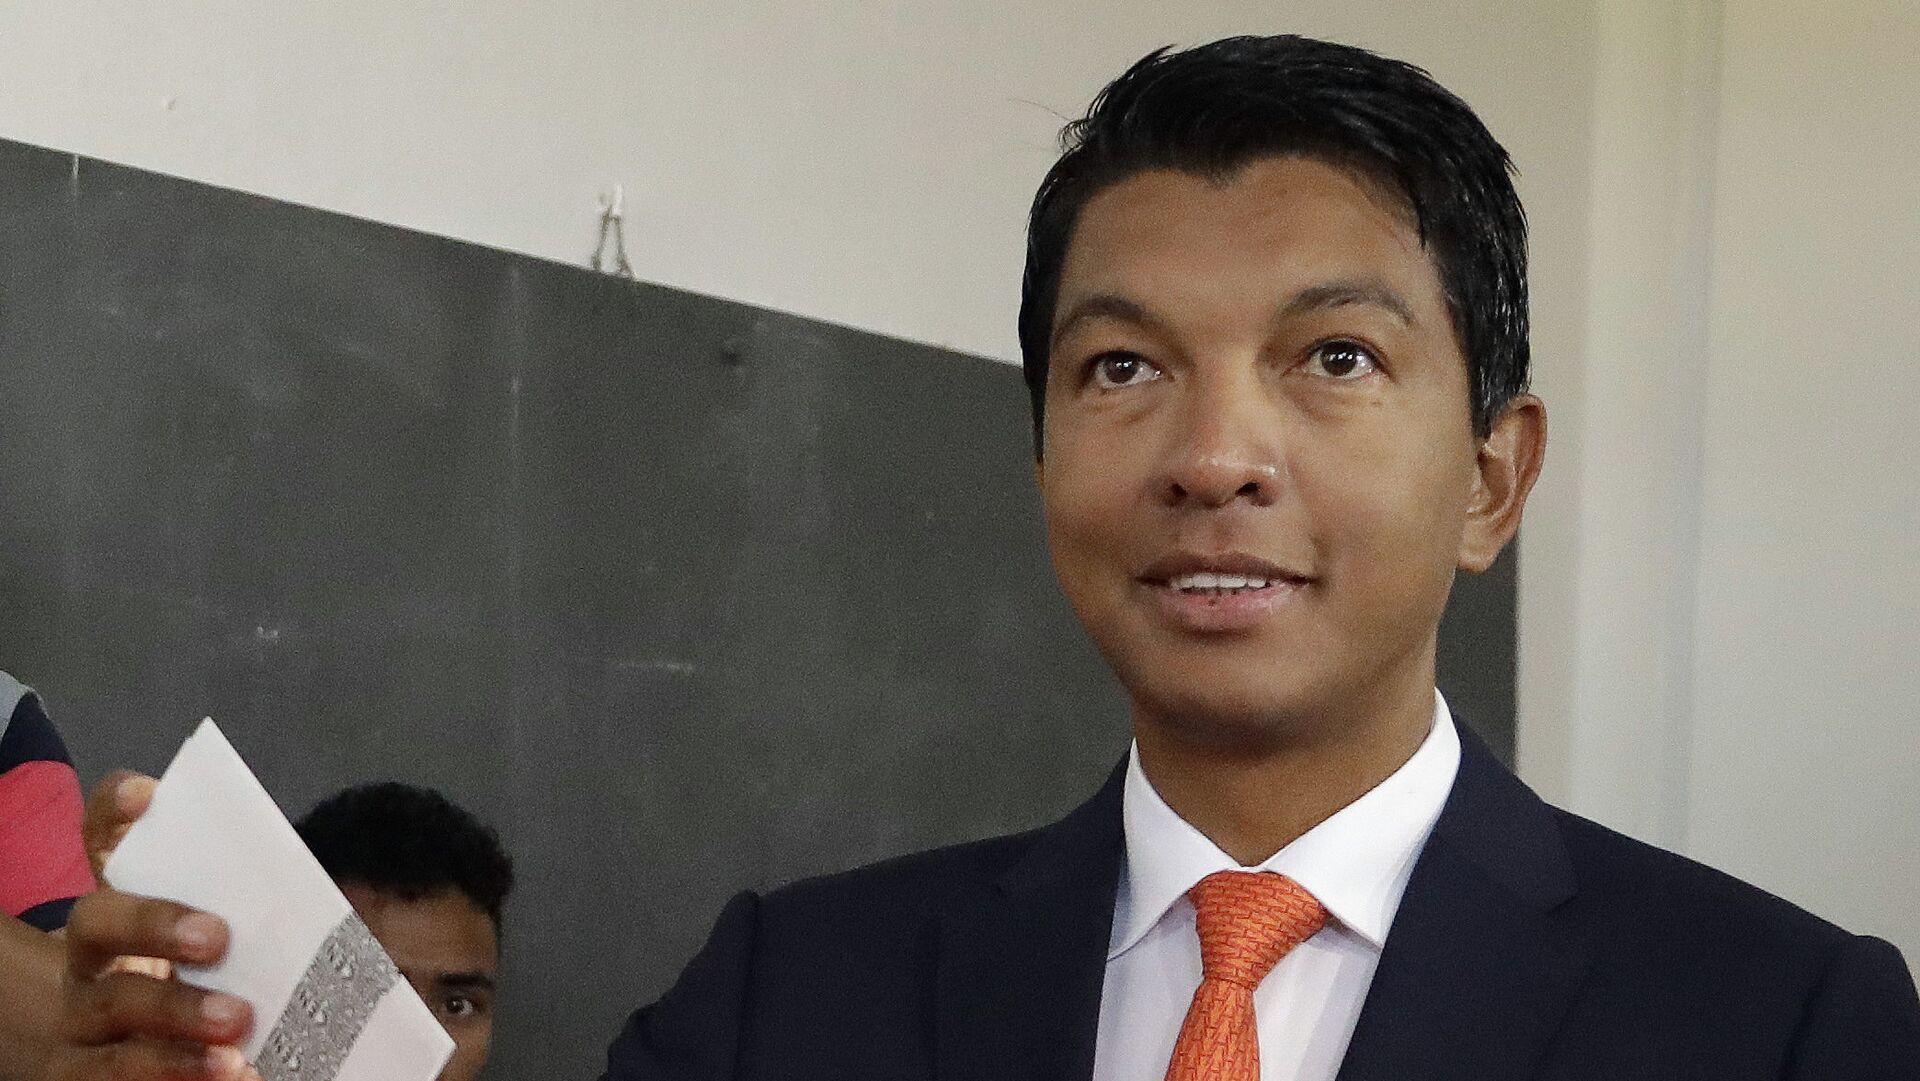 Il presidente del Madagascar Andry Rajoelina - Sputnik Italia, 1920, 22.07.2021